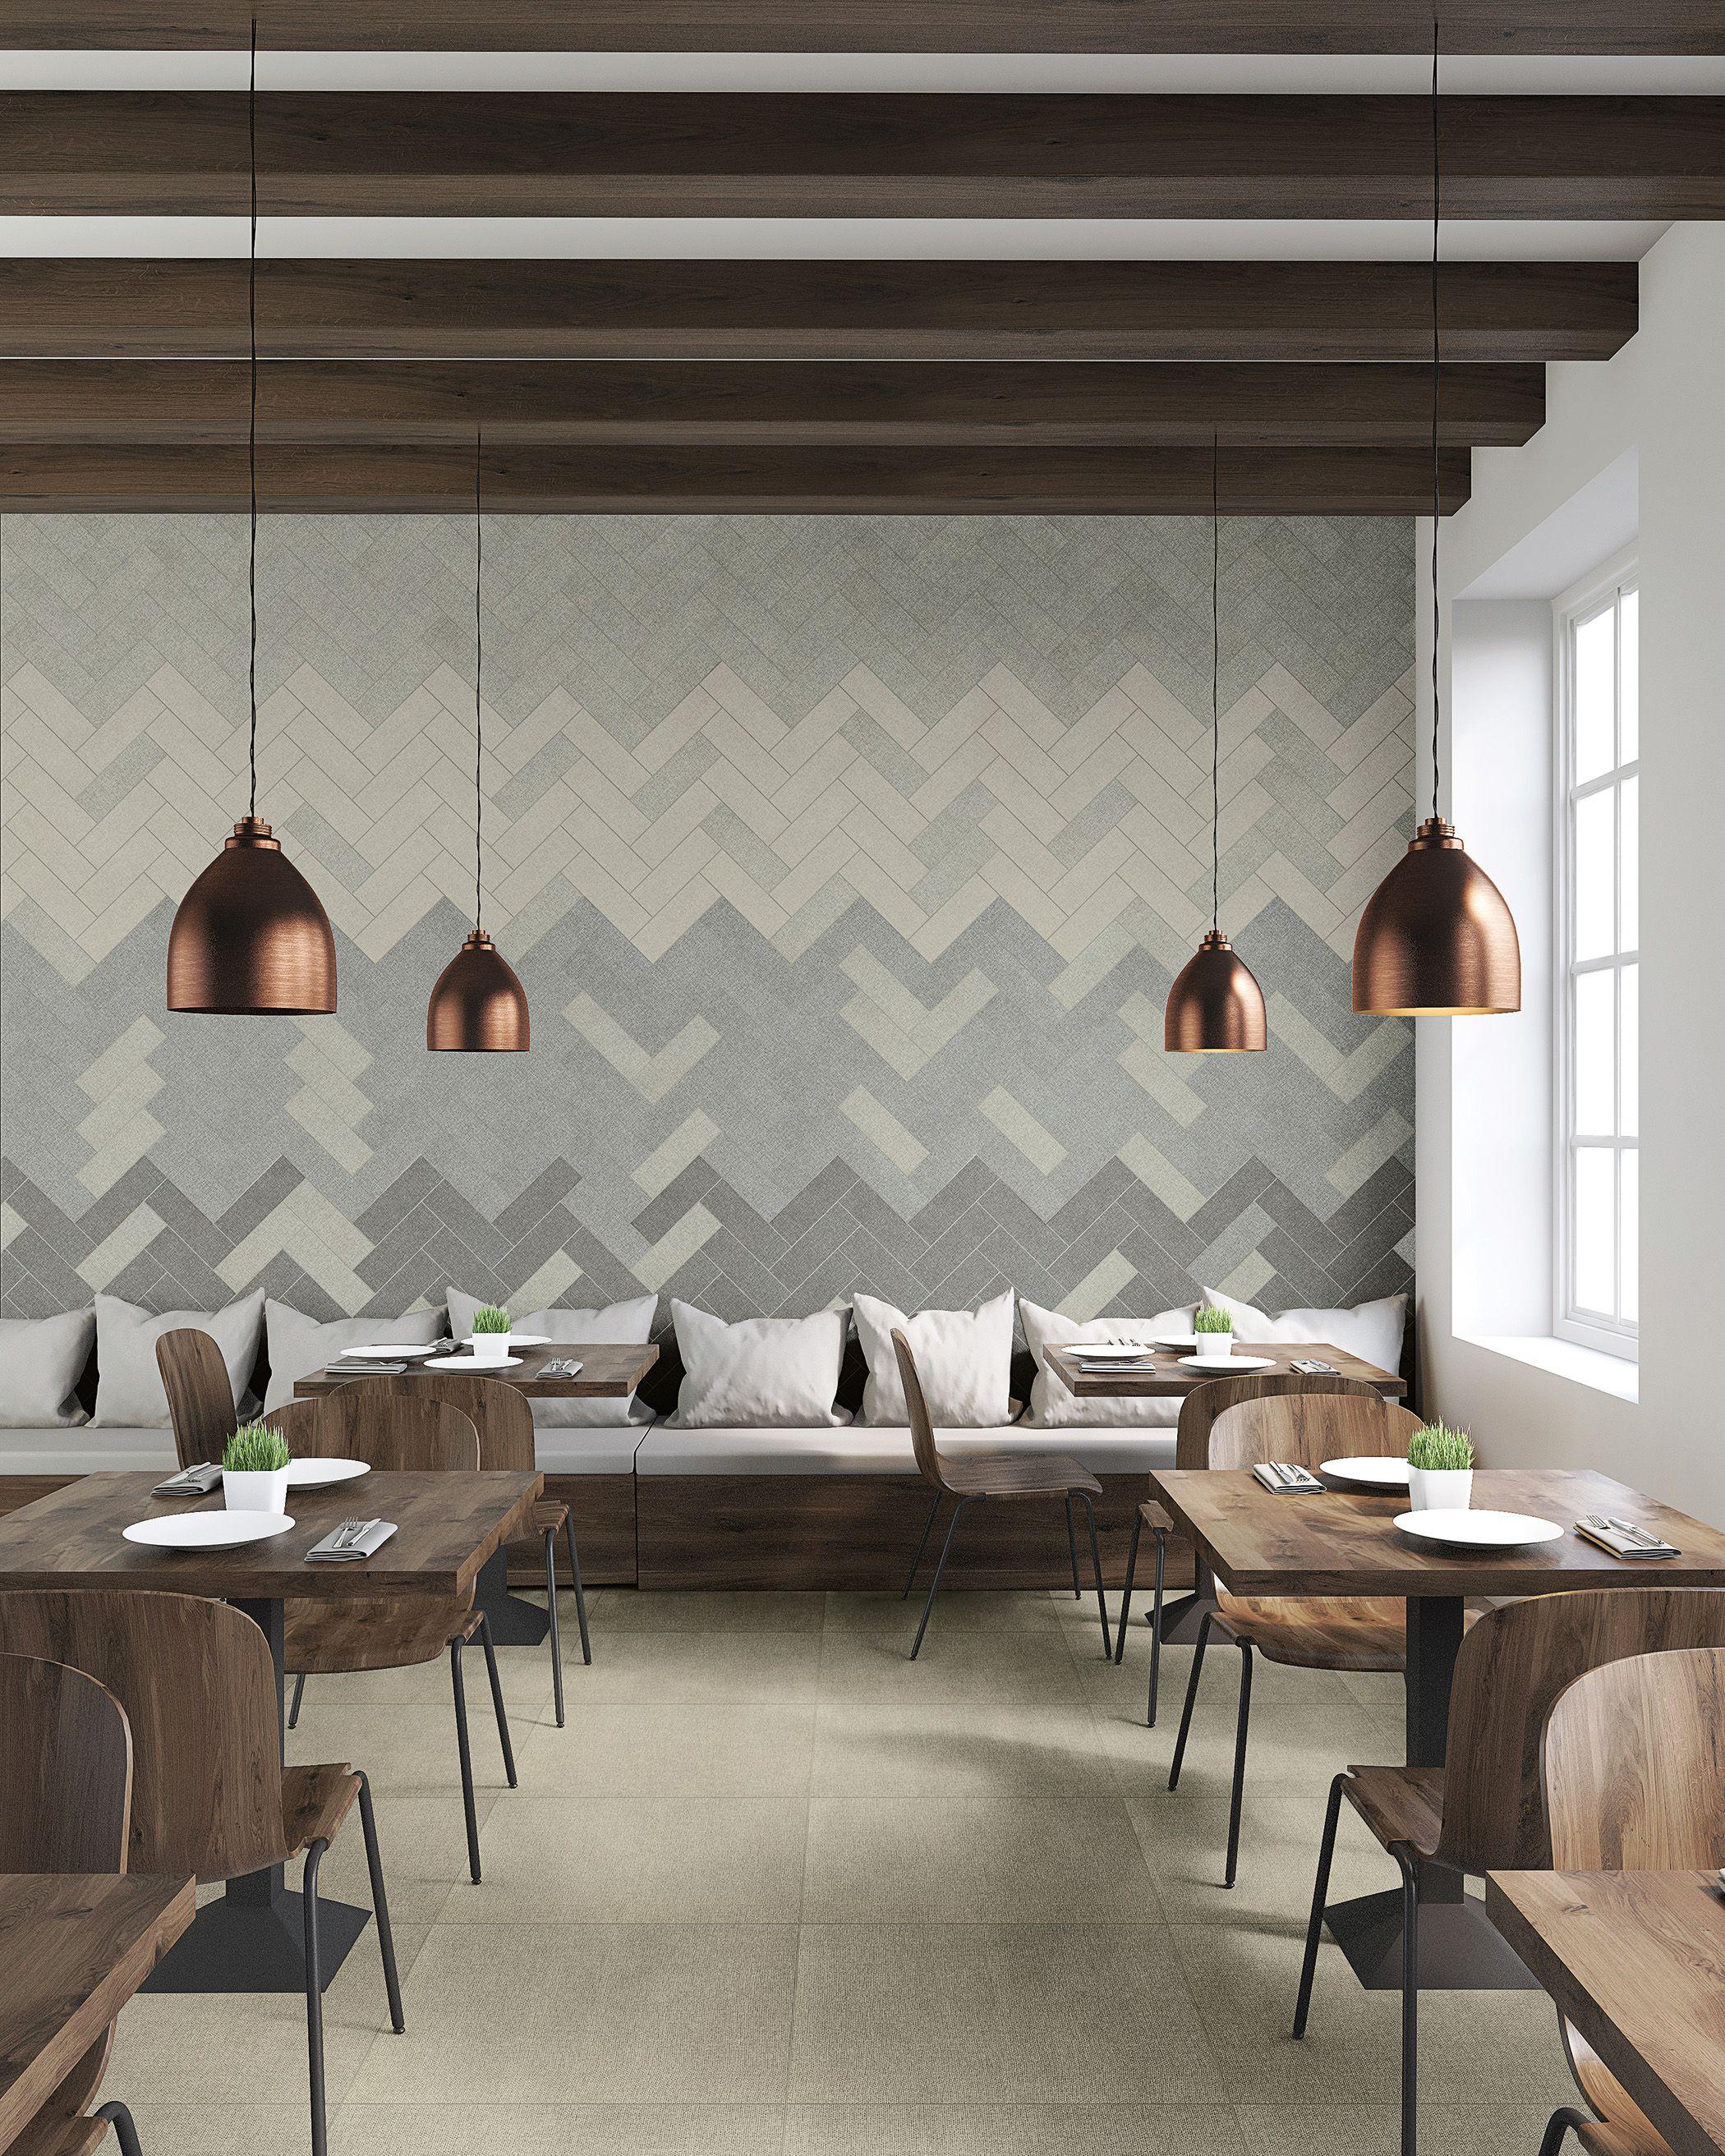 Pin on Interior Design Trends